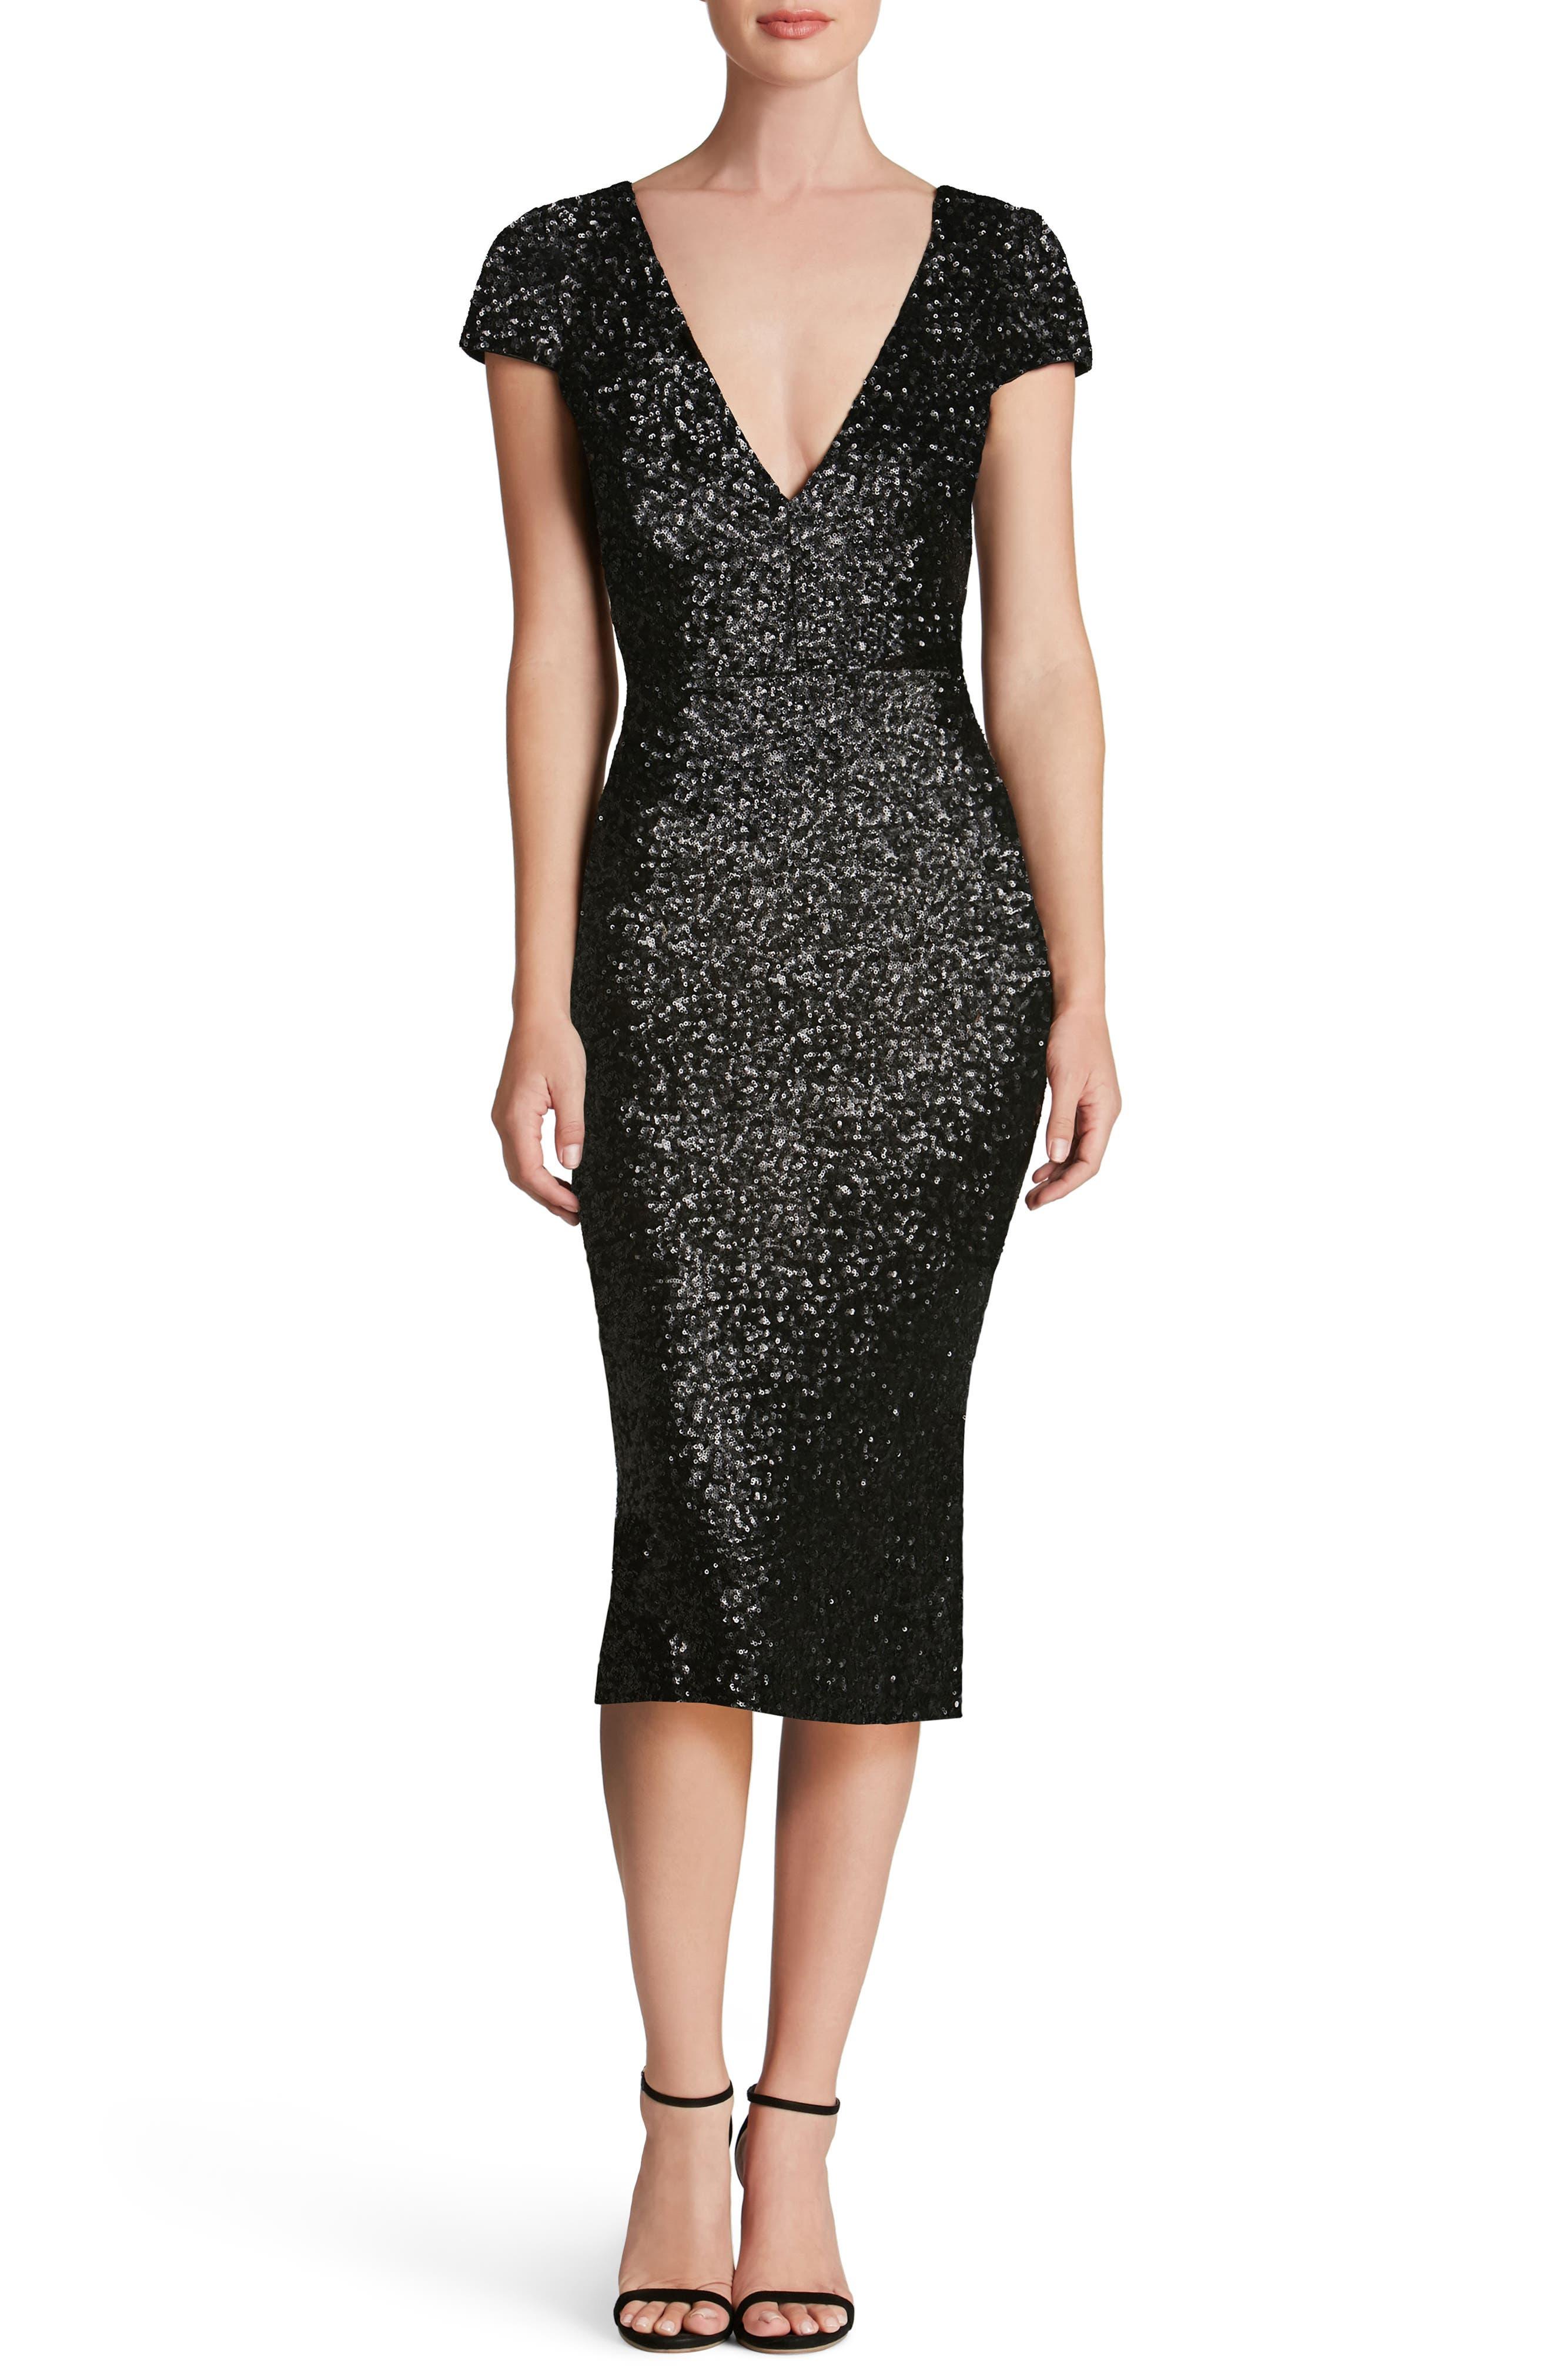 DRESS THE POPULATION Allison Sequin Sheath Dress, Main, color, 008